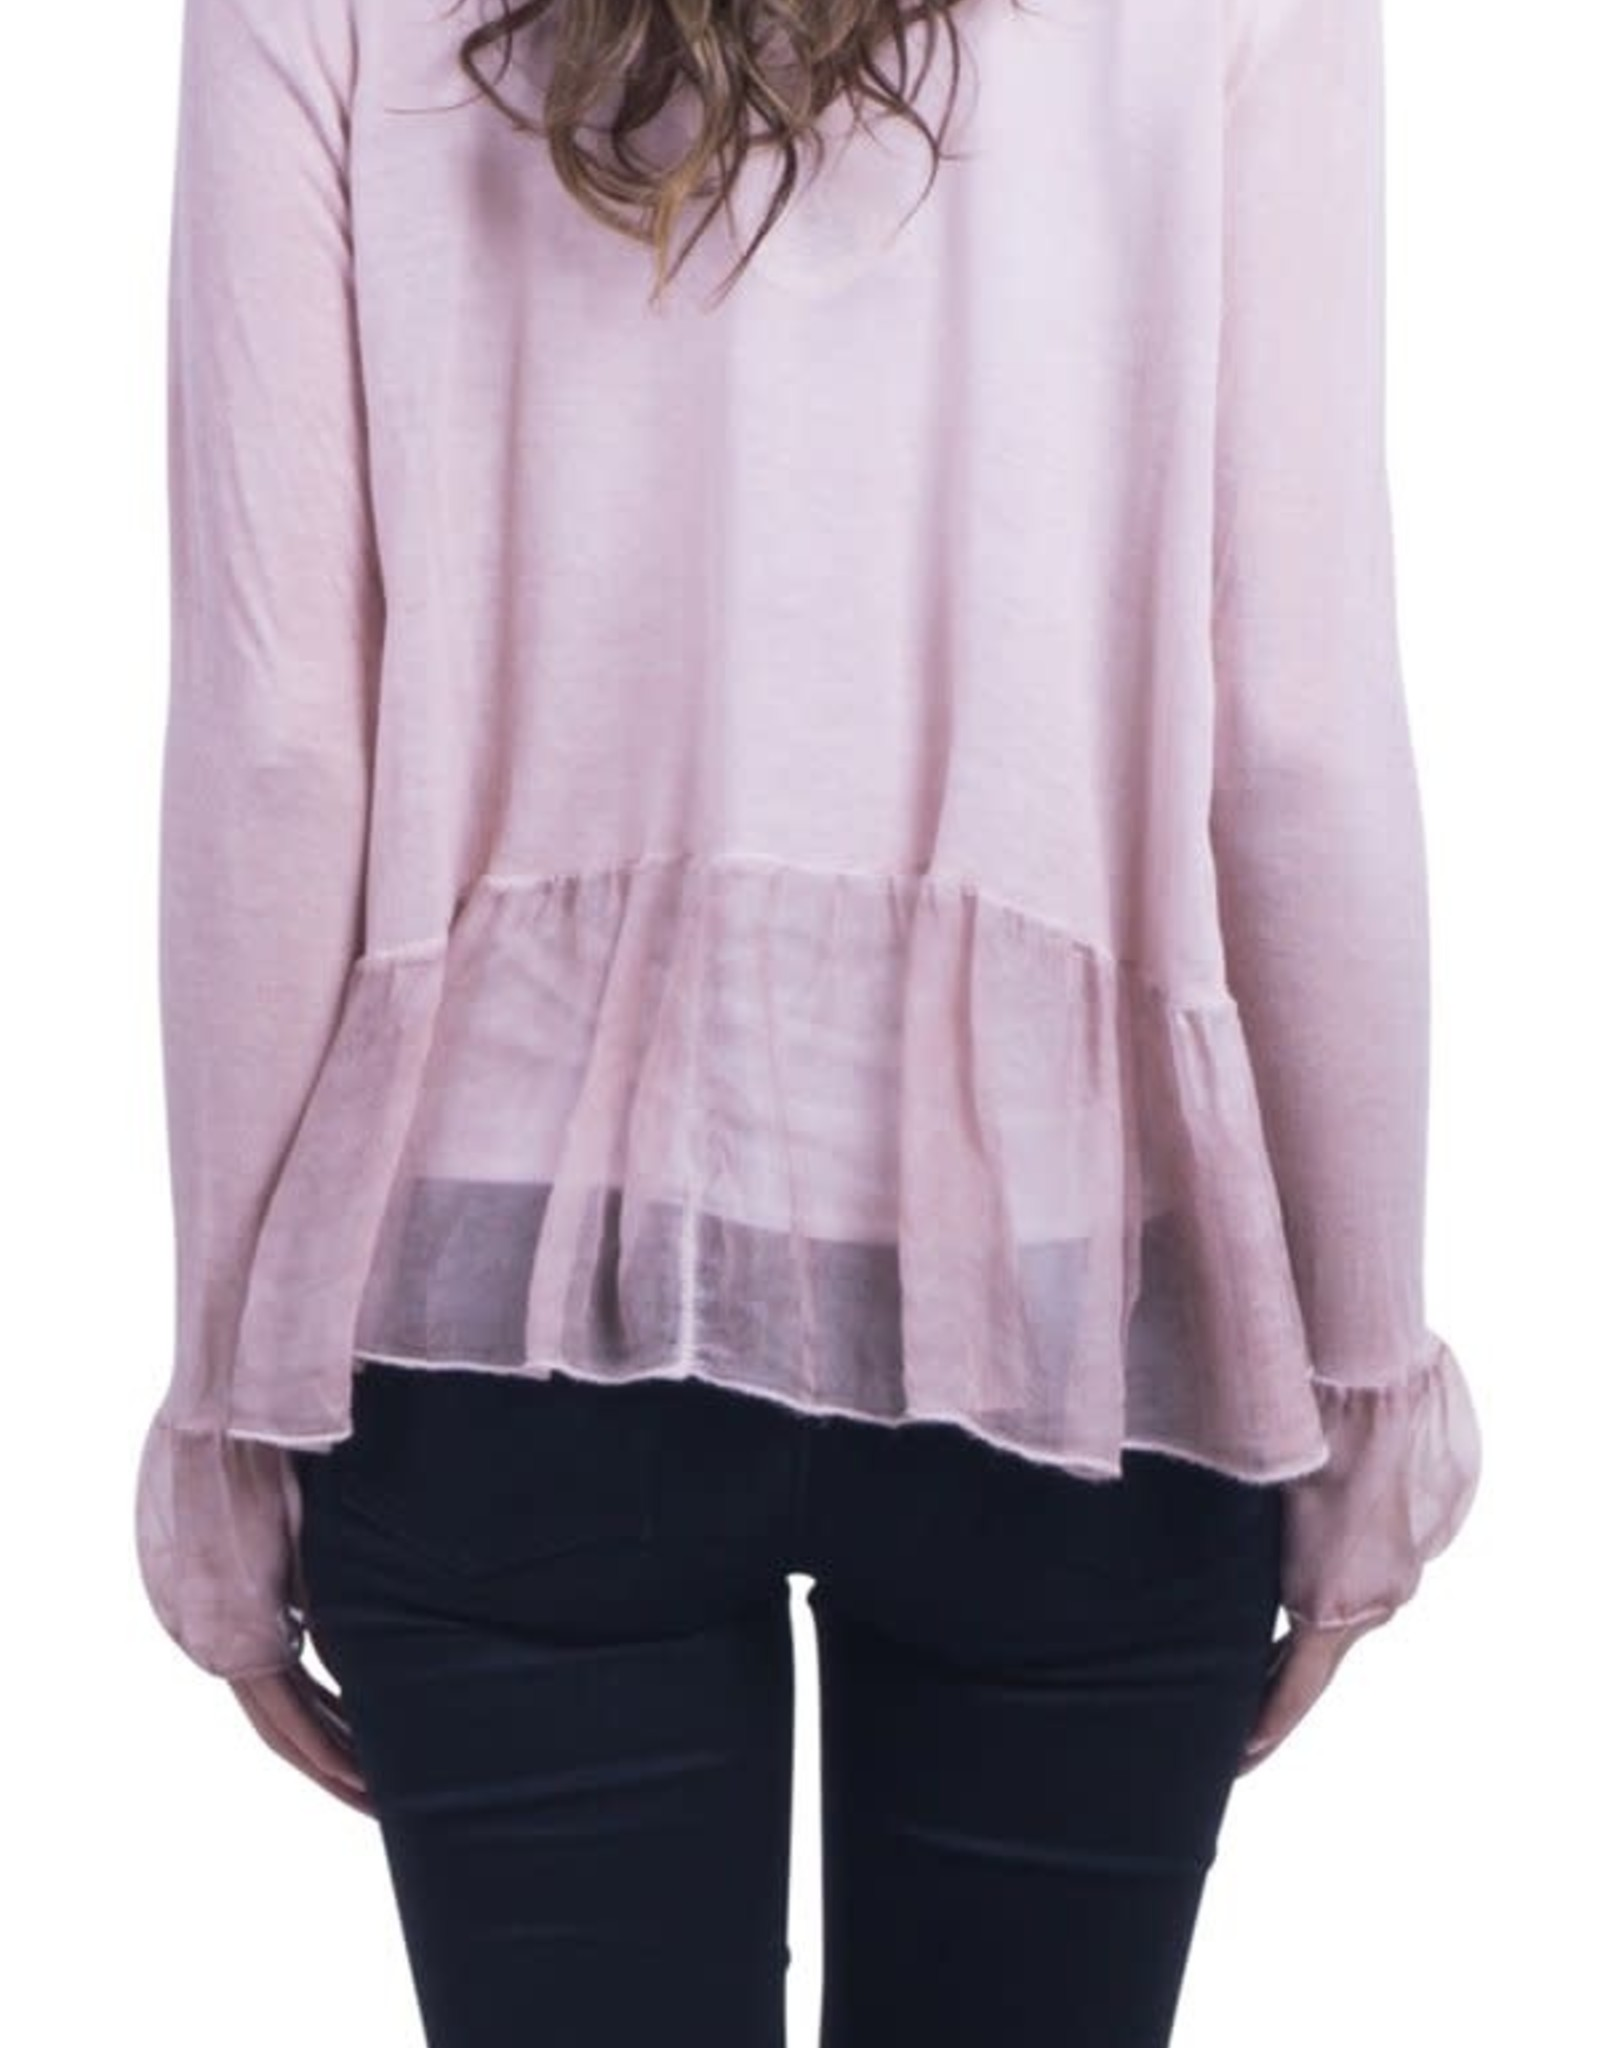 Vera Silk Jacket with Ruffle - Cream